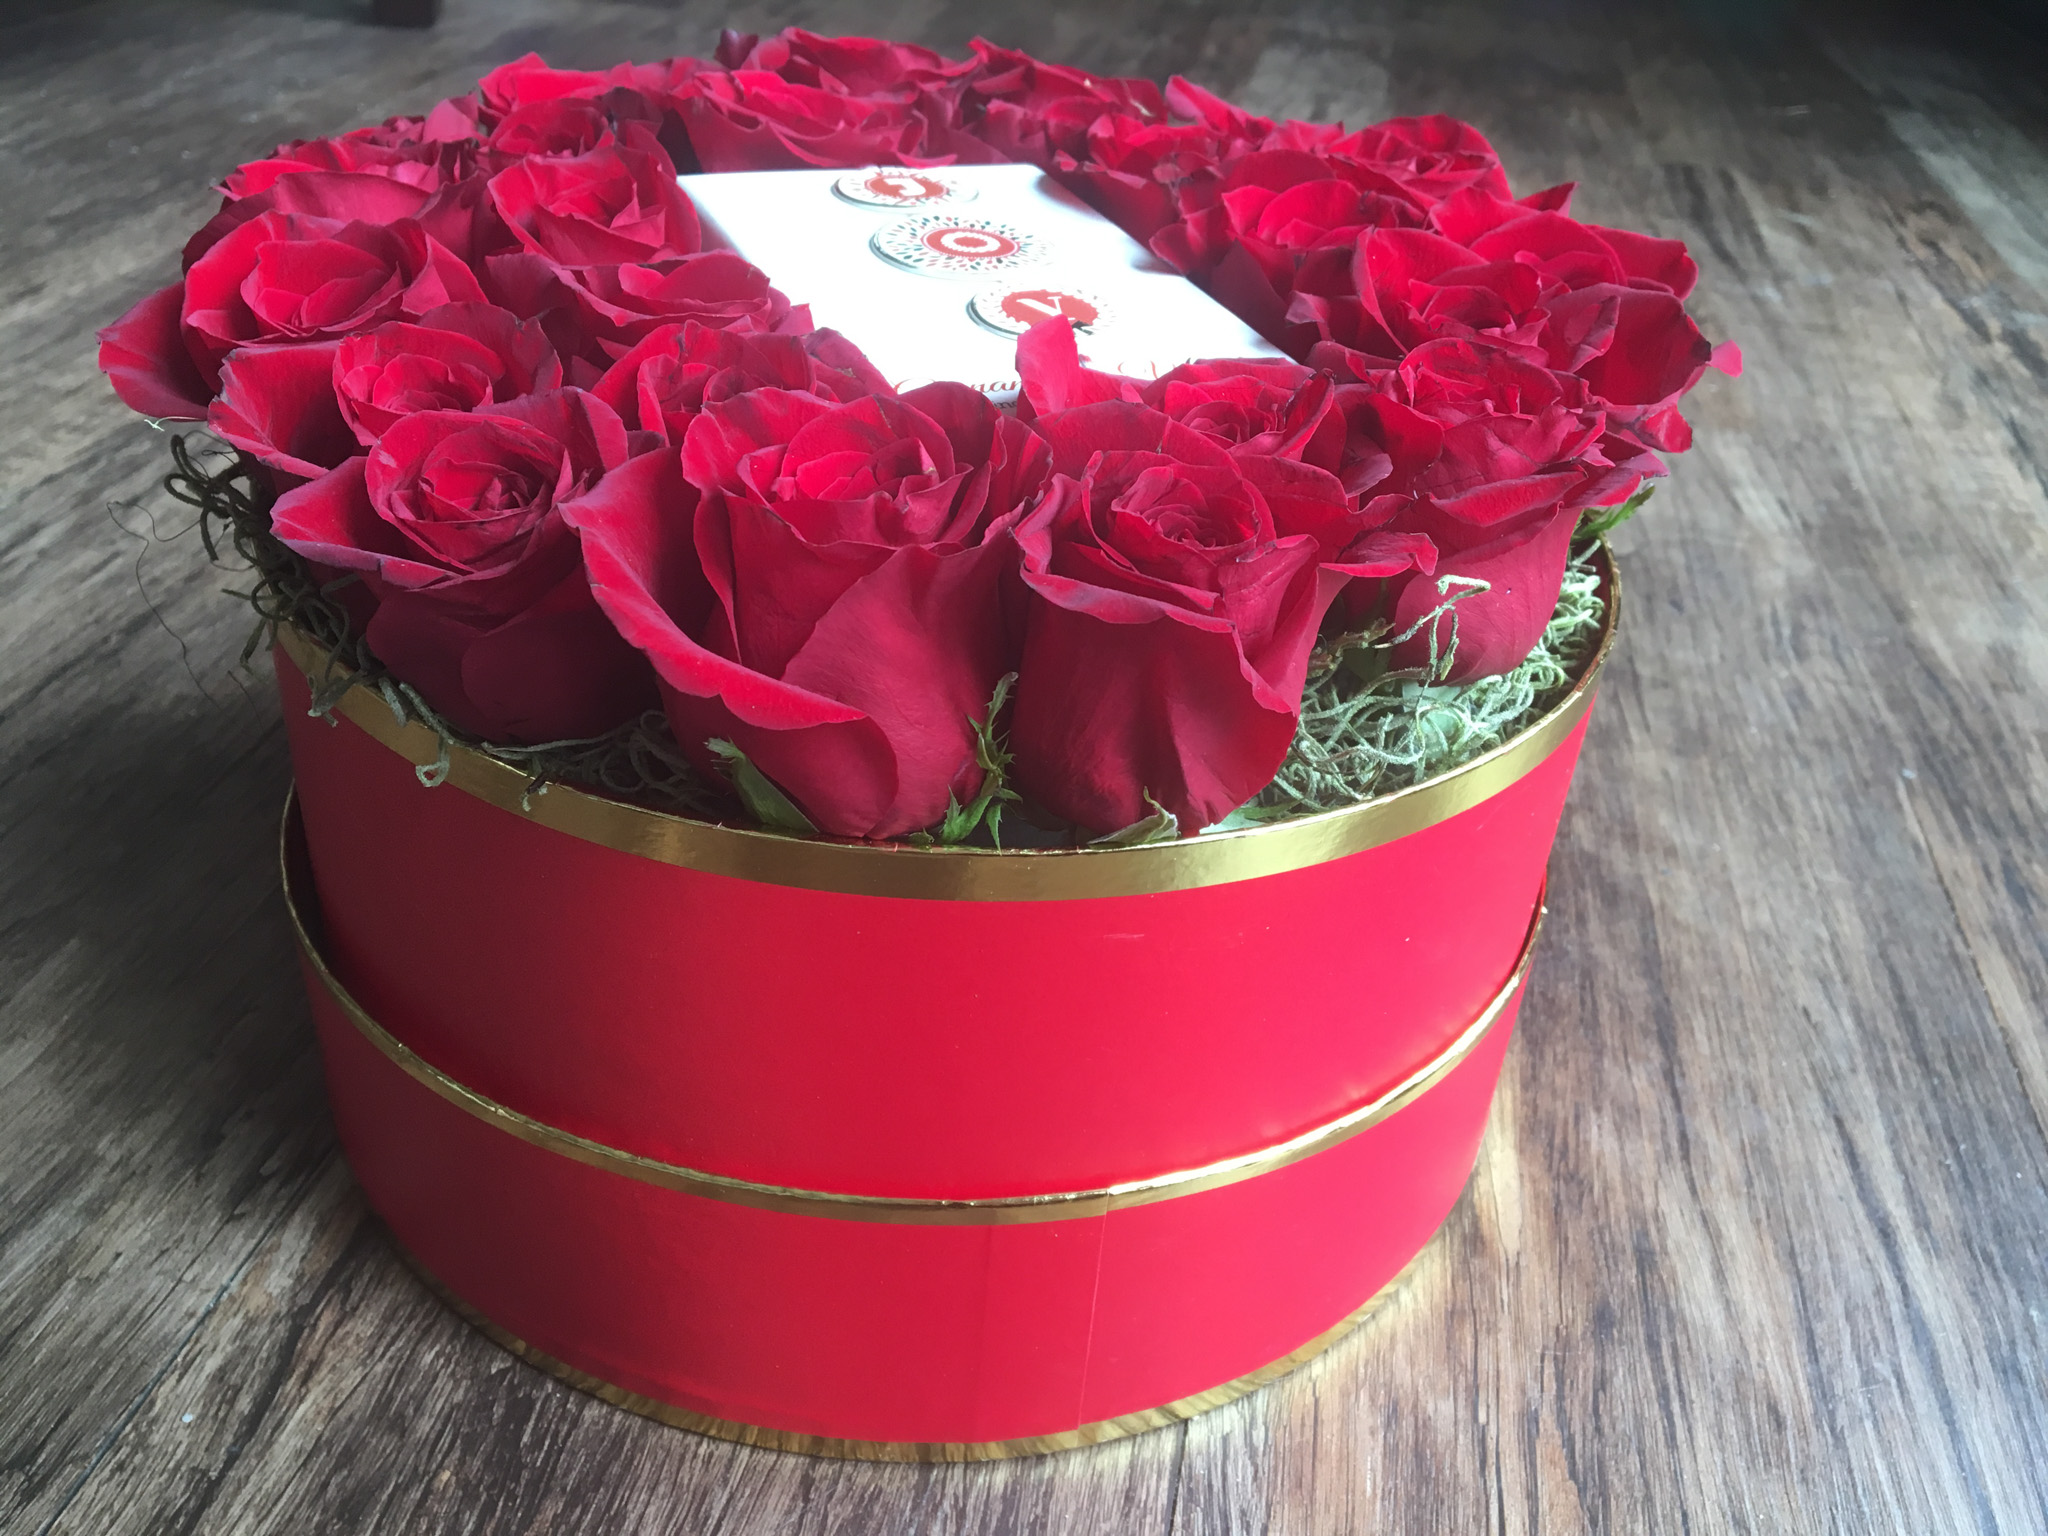 redroses_roundbox_gift2.jpg